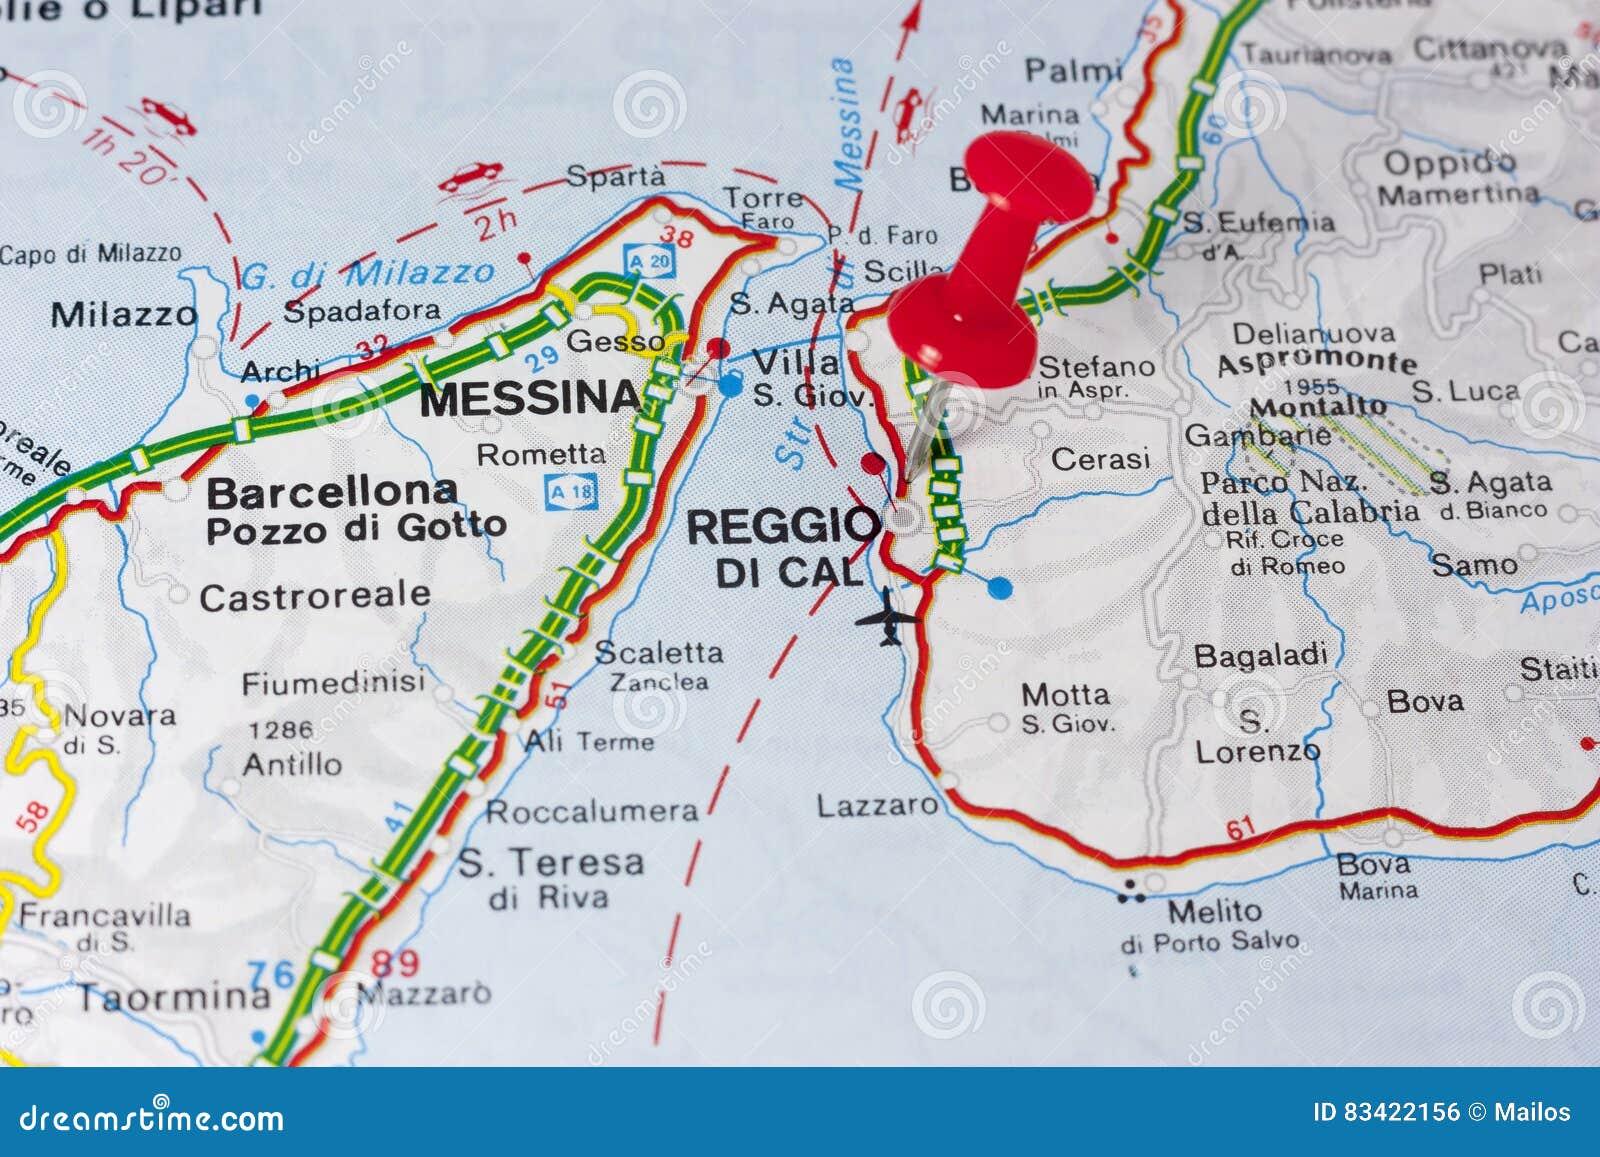 Reggio Calabria Italy On A Map Stock Illustration - Illustration of ...